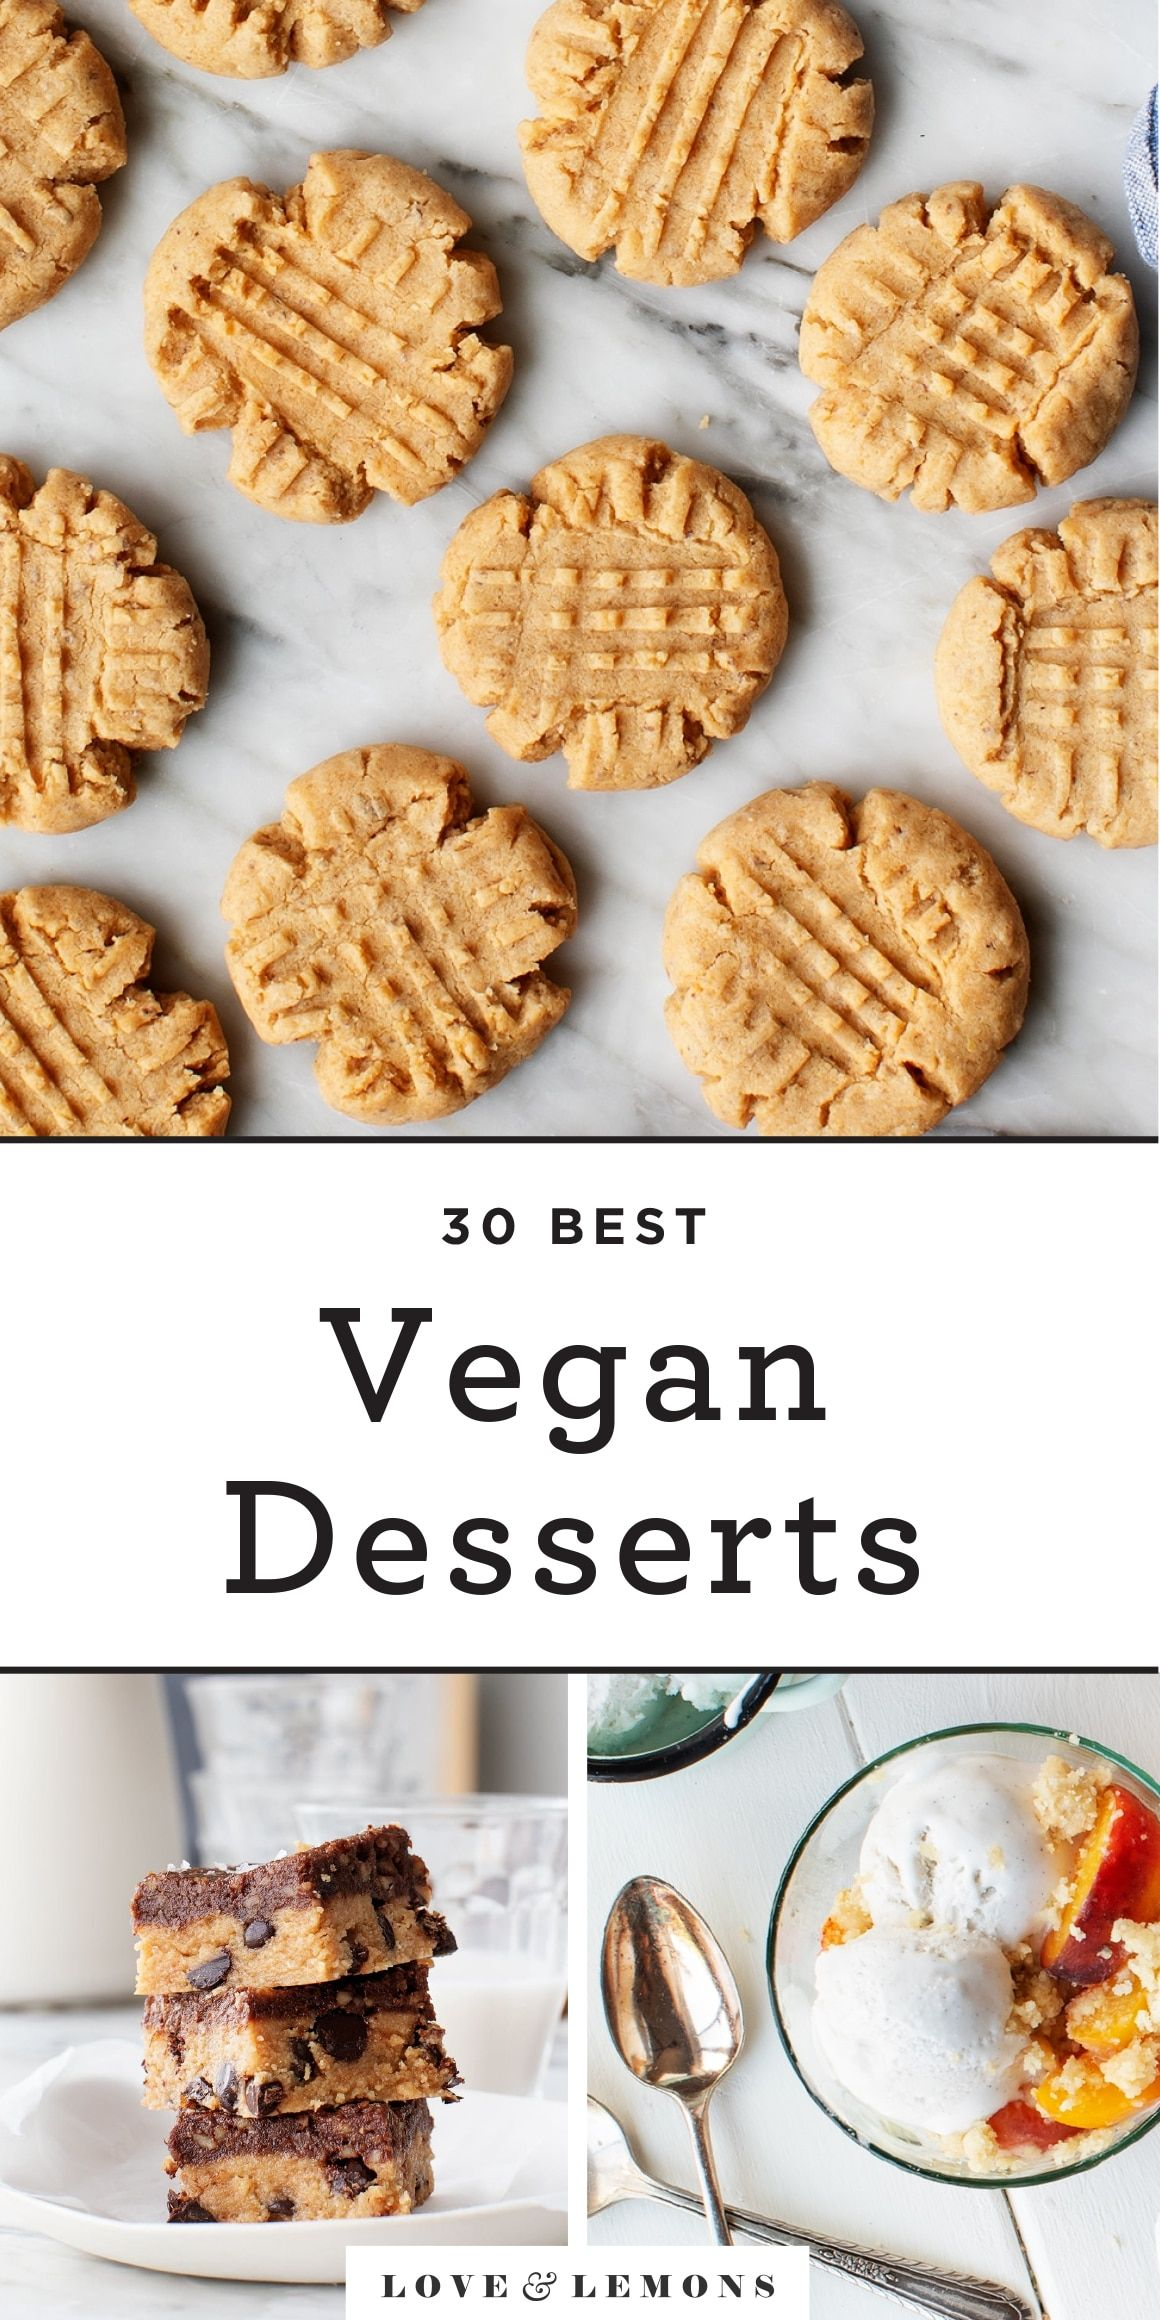 30 Best Vegan Desserts Recipes By Love And Lemons Recipe Vegan Dessert Recipes Dessert Recipes Best Vegan Desserts